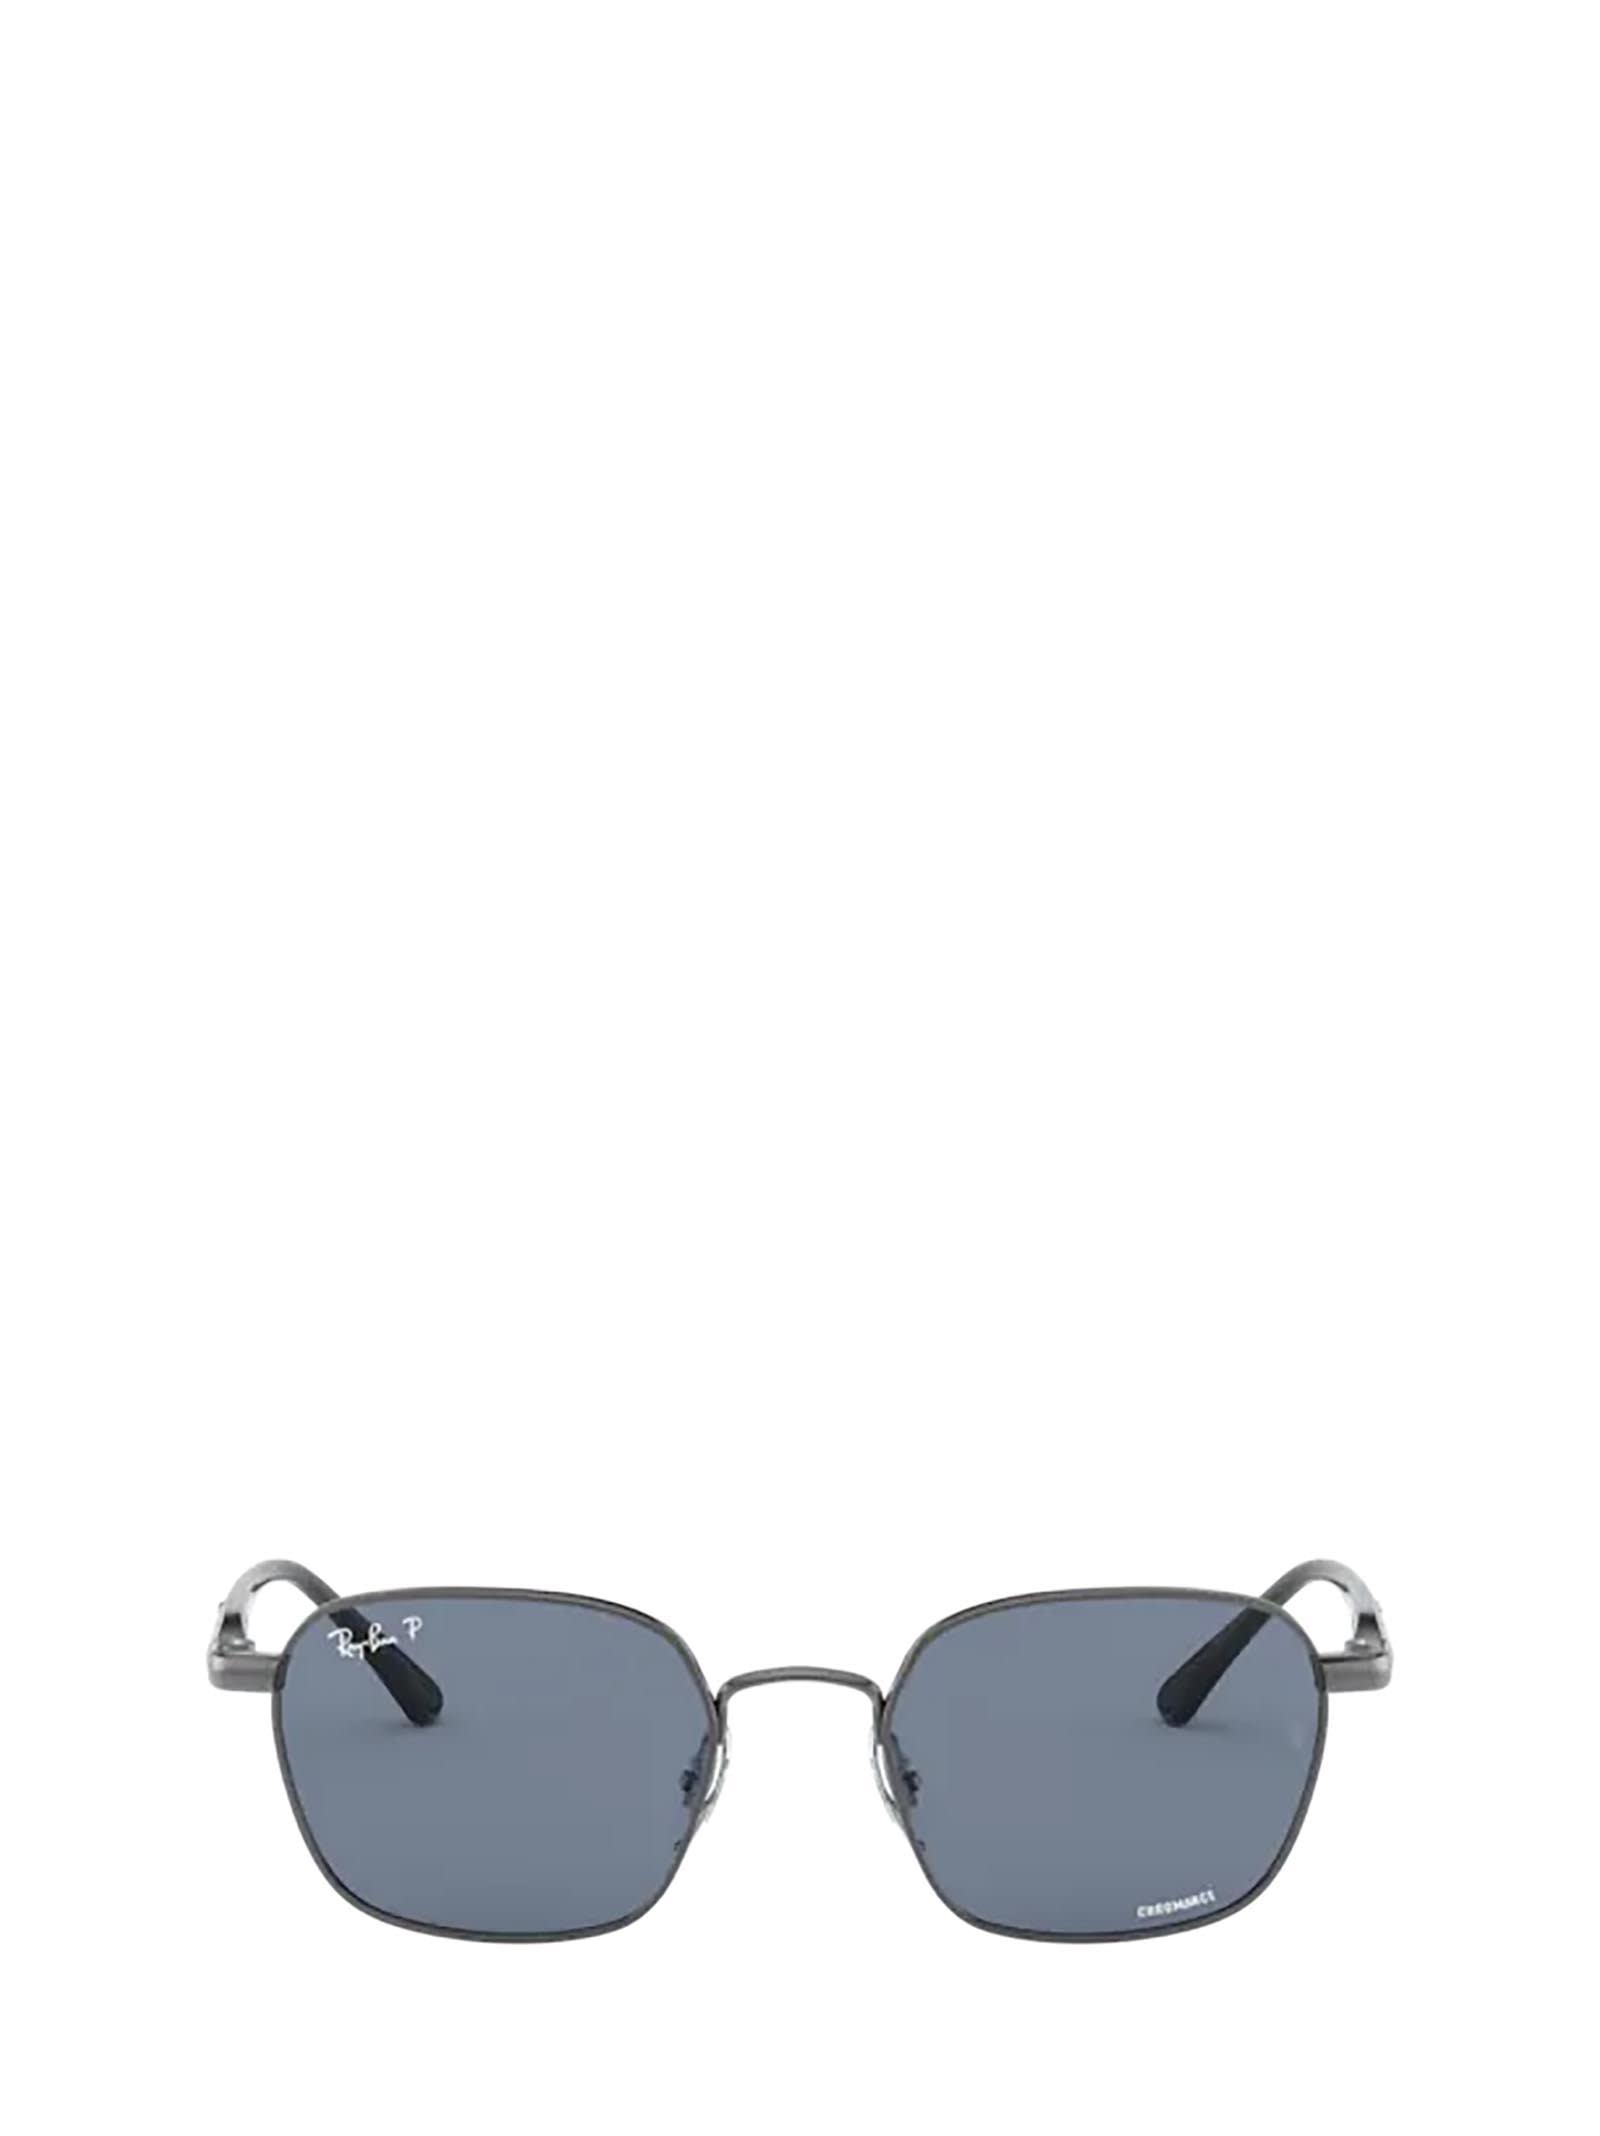 Ray-Ban Ray-ban Rb3664ch Gunmetal Sunglasses